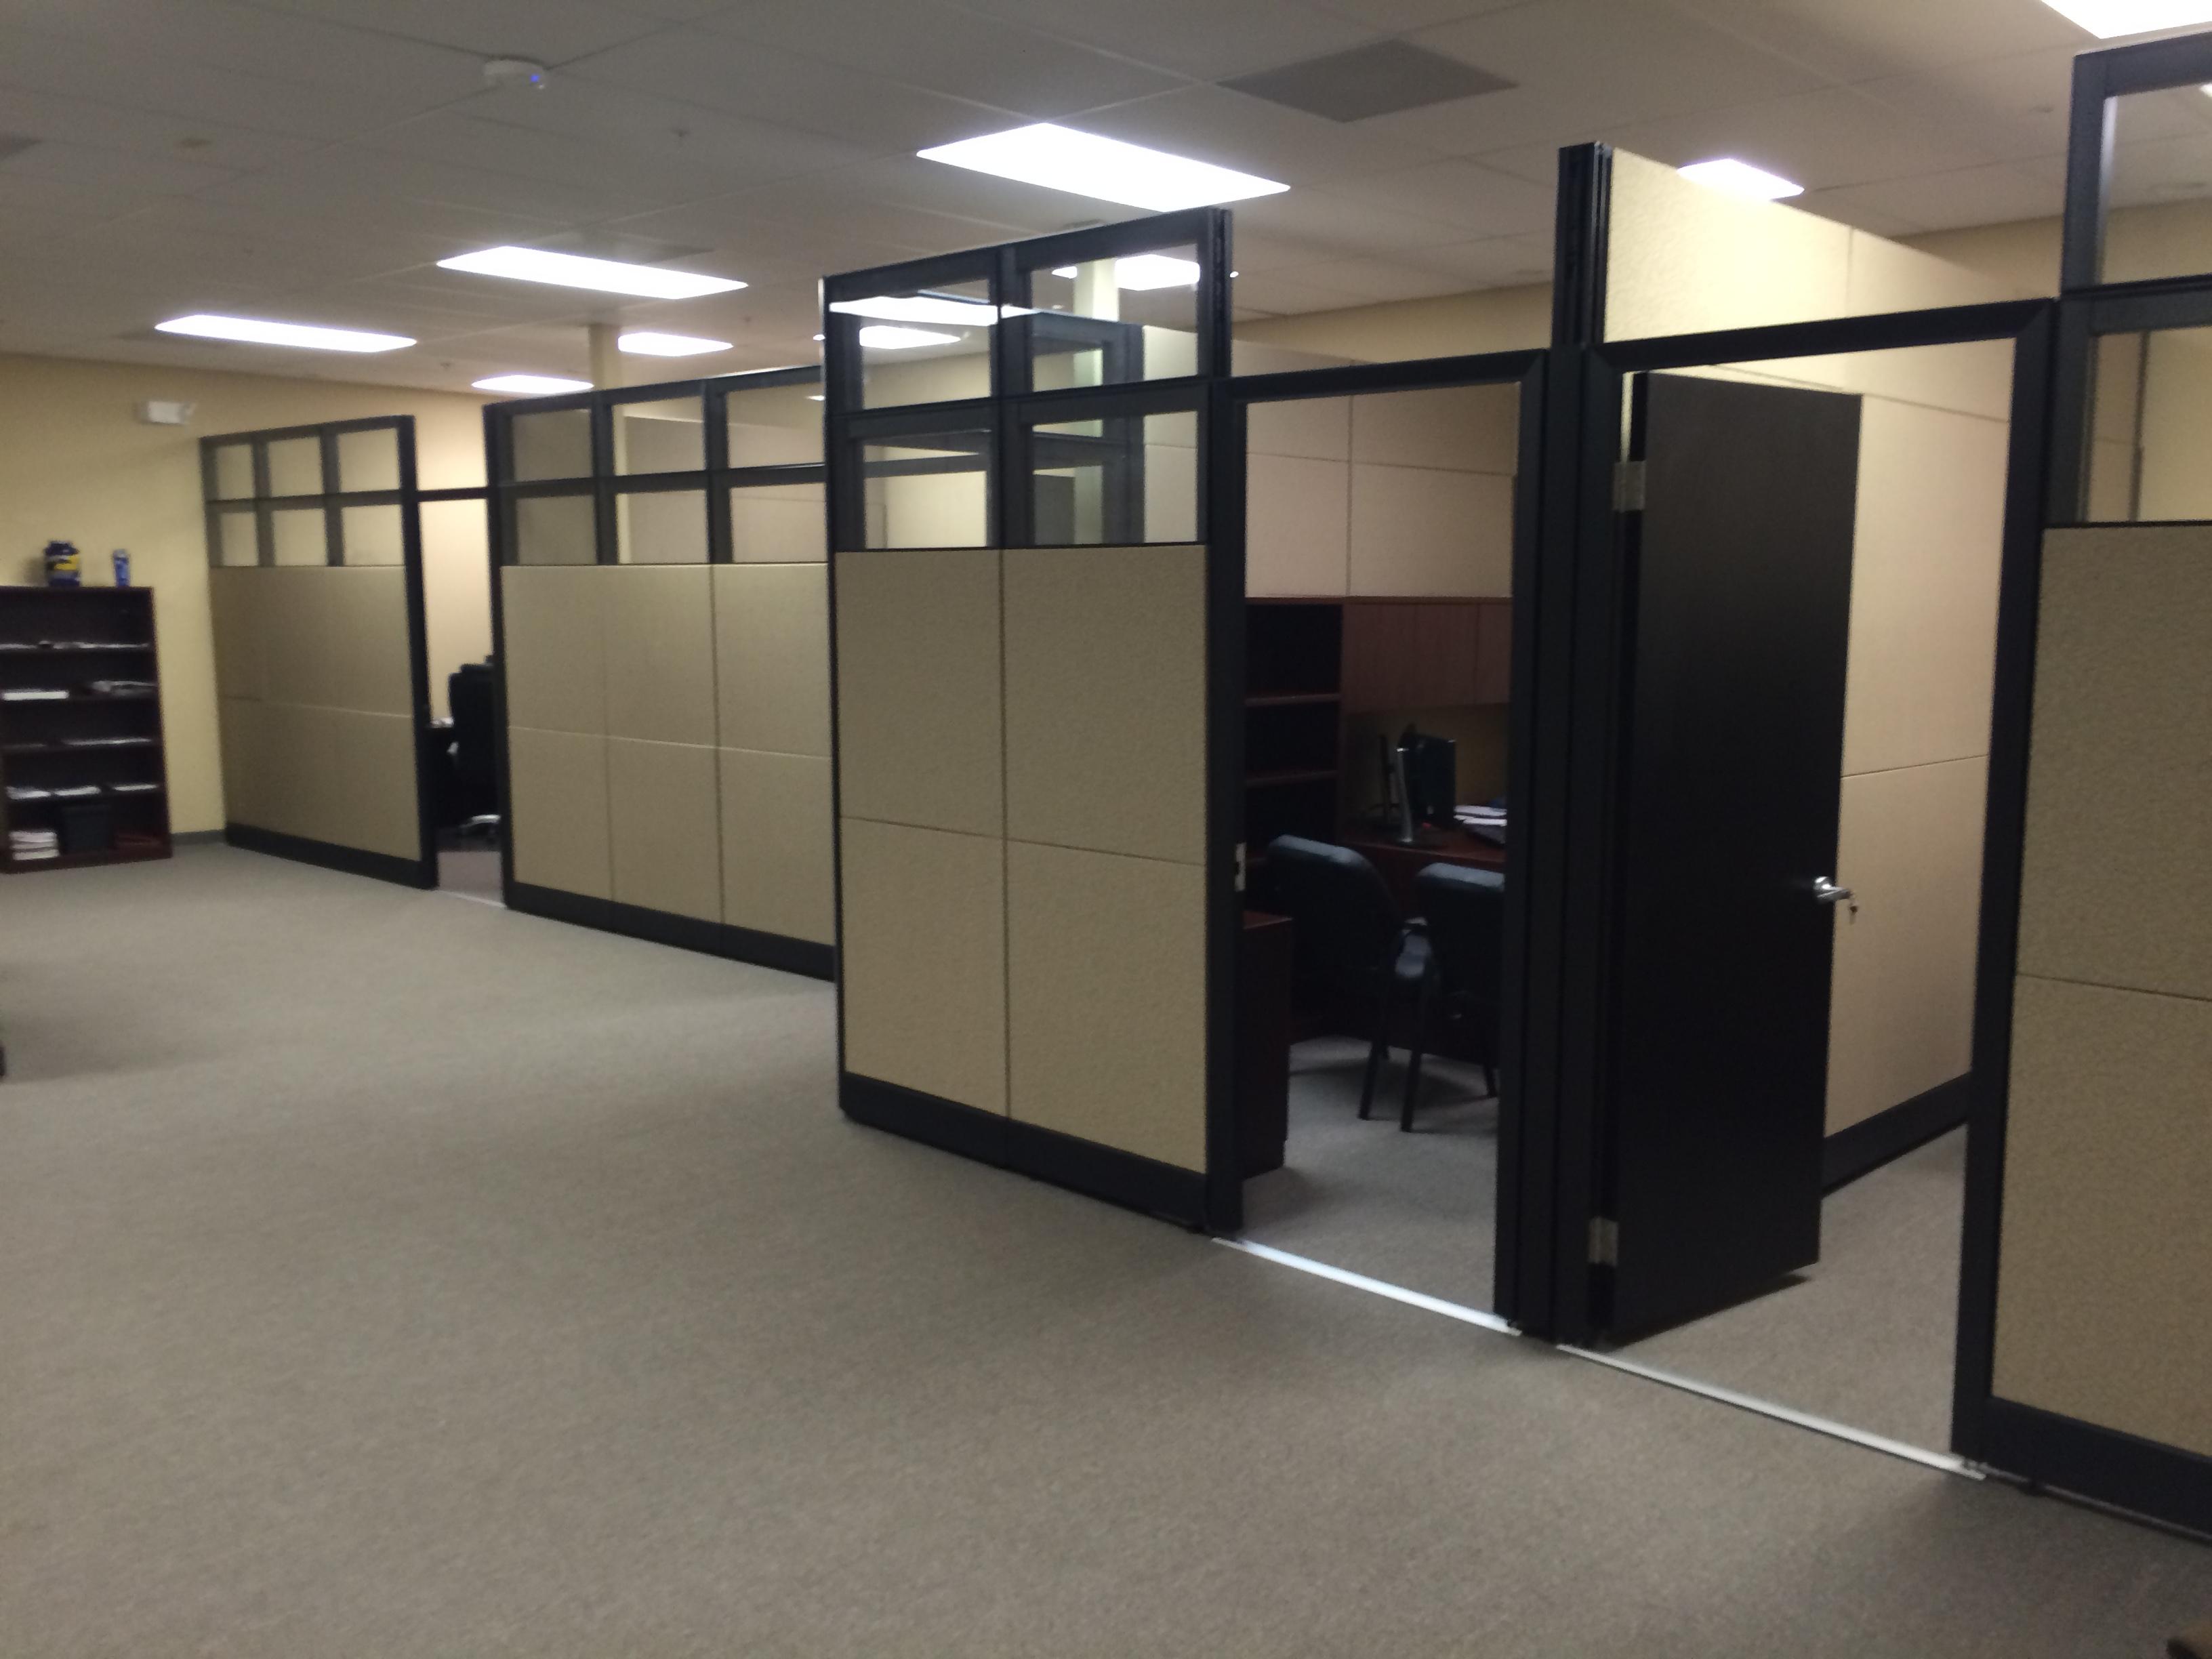 manasota-office-supplies-llc-20170320-172631-6-.jpg